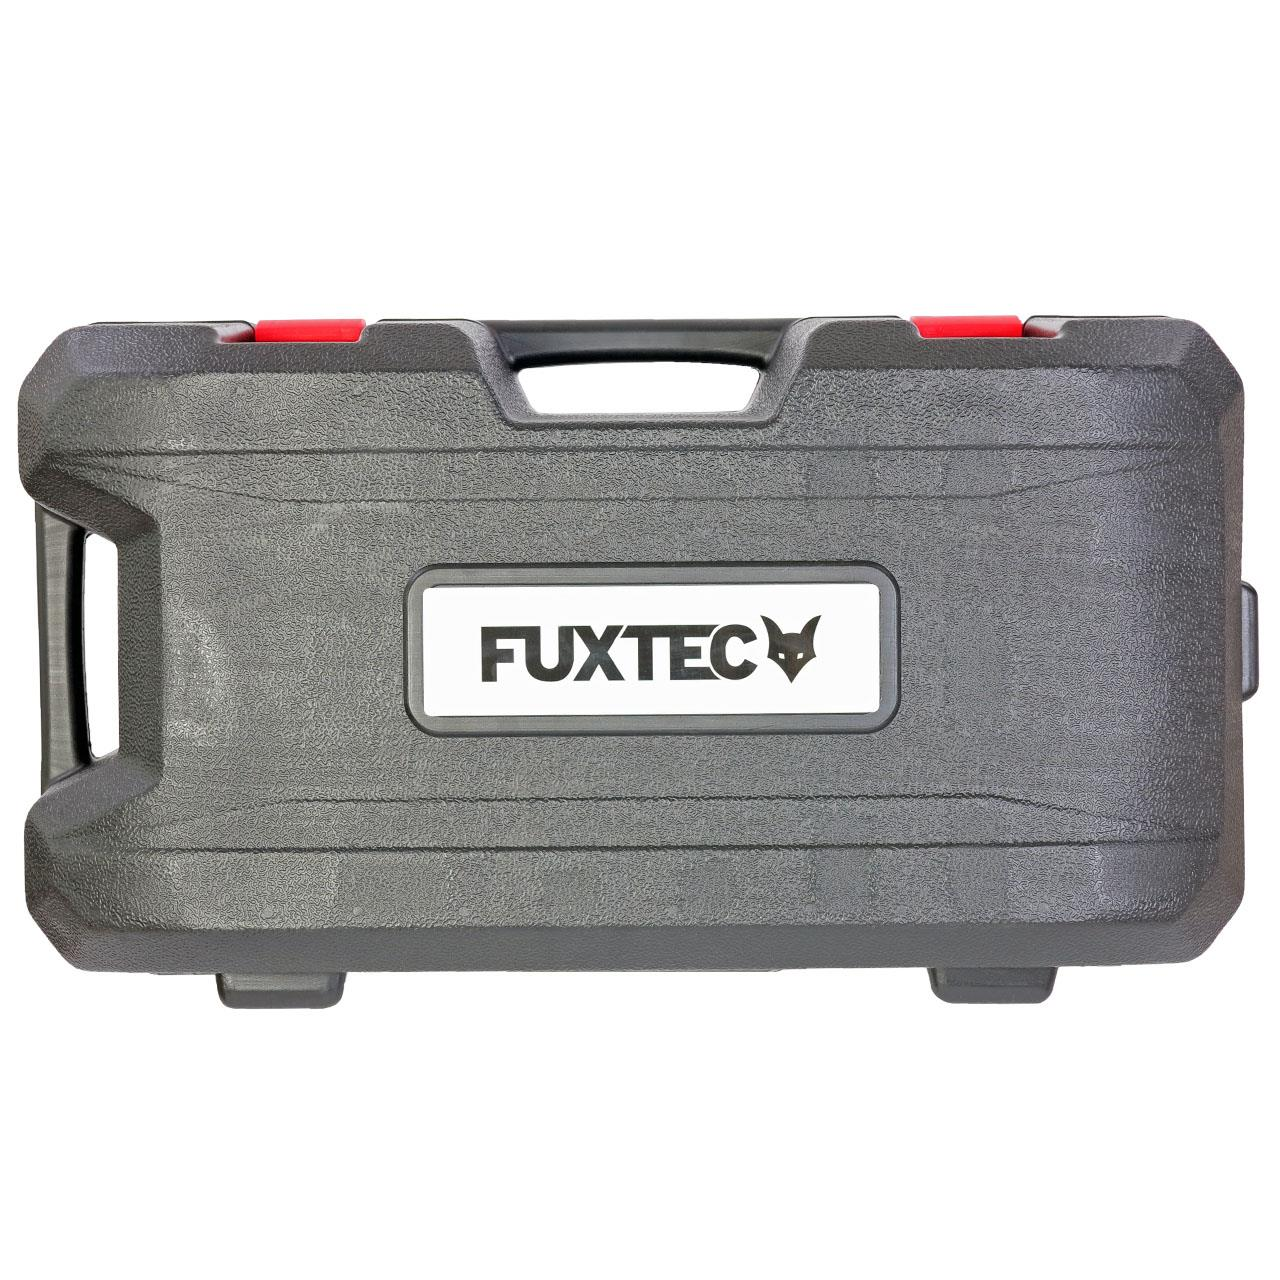 FUXTEC Pfahlramme FX-PR165